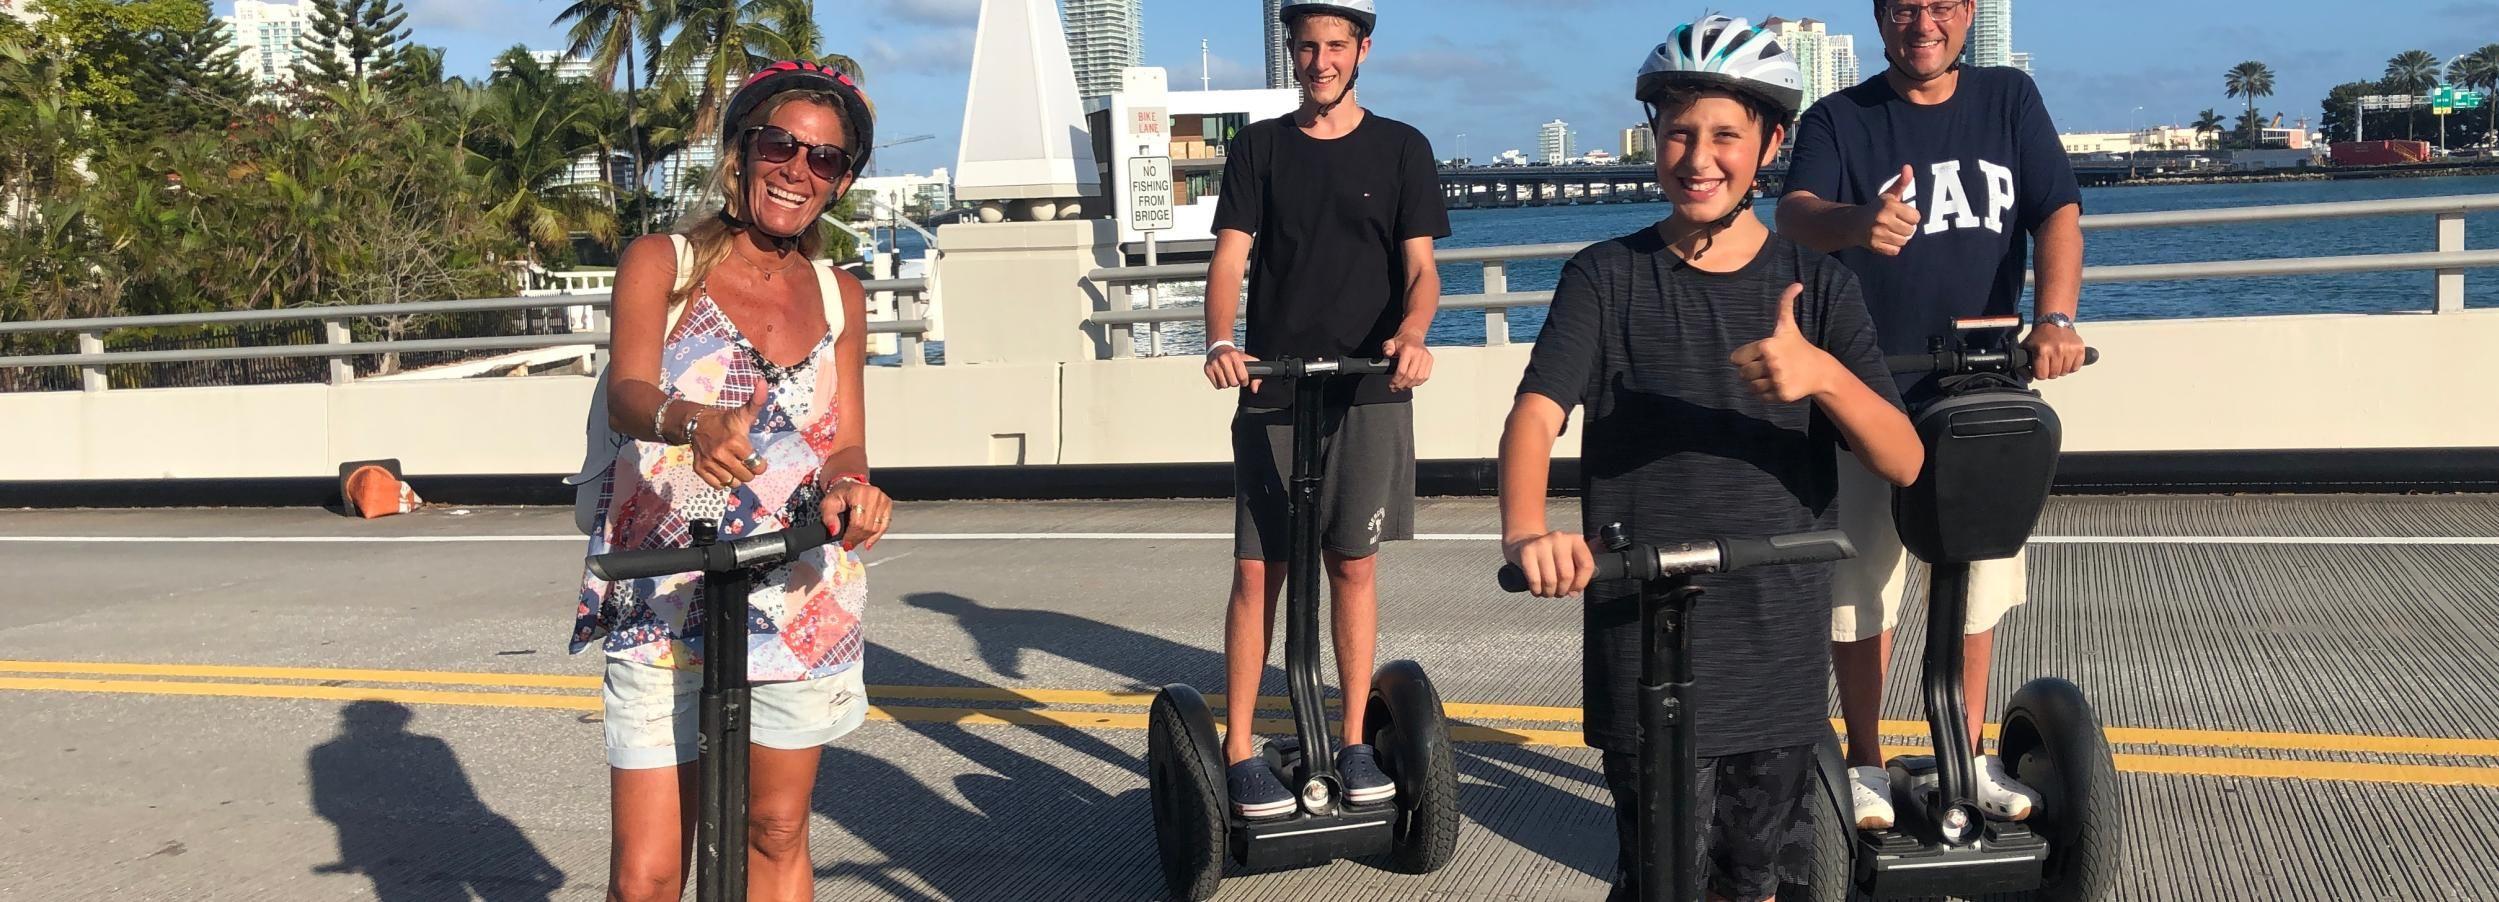 Tour di Miami South Pointe Pier Segway